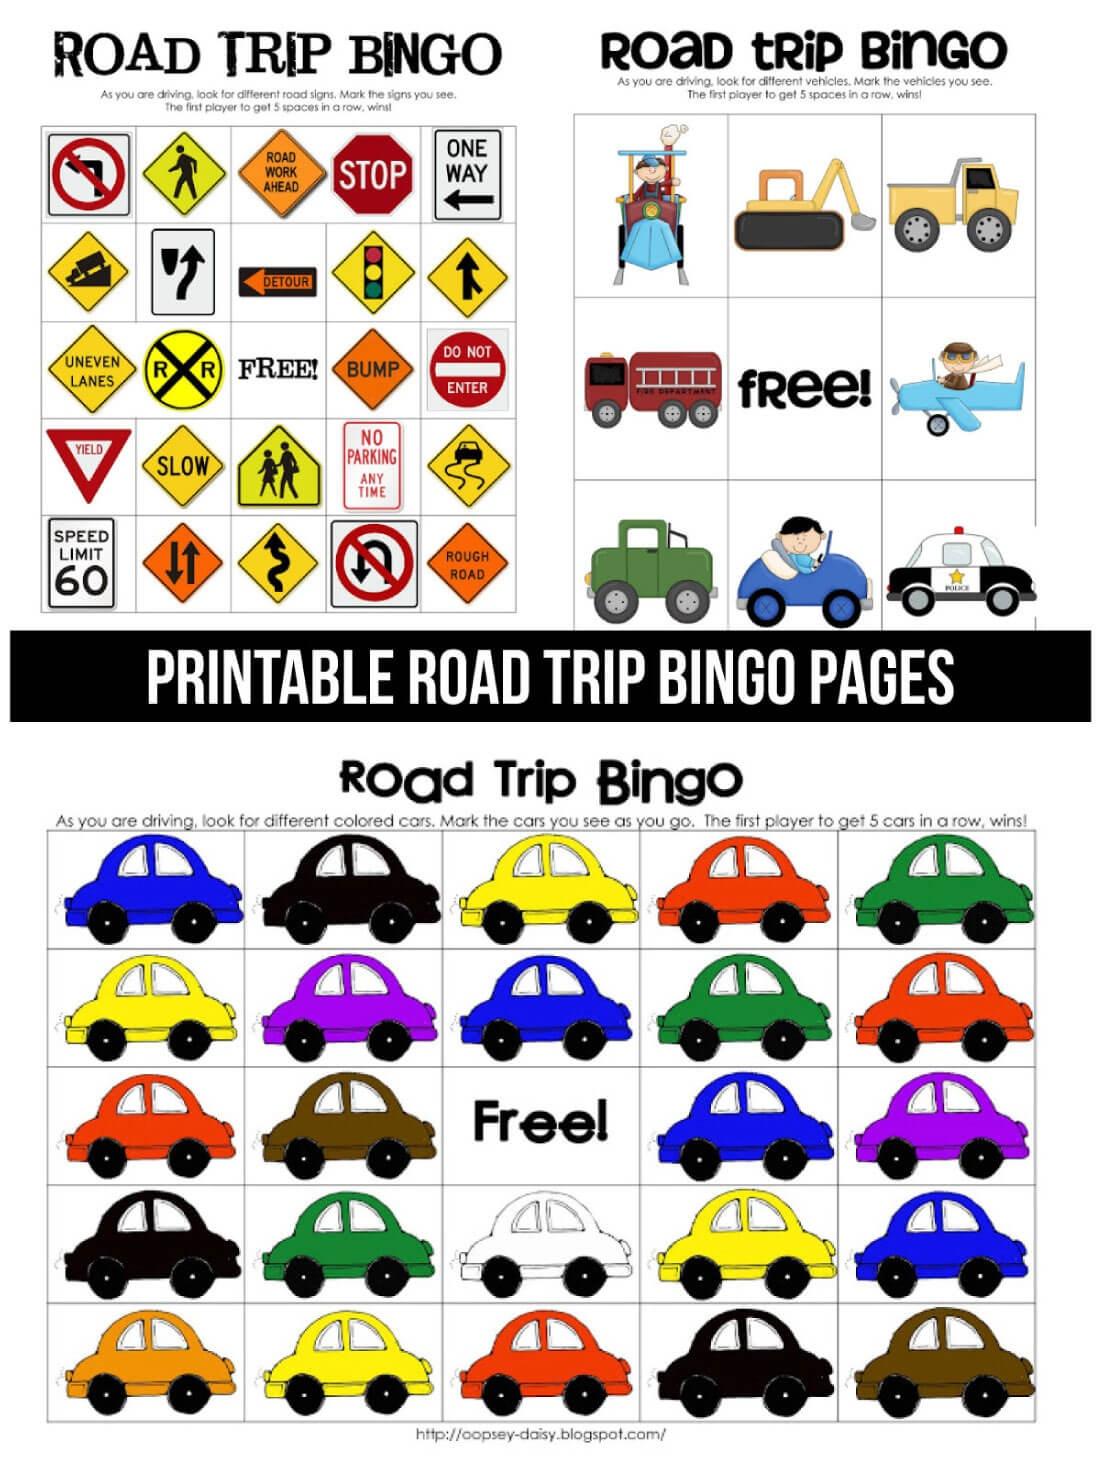 Printable Road Trip Bingo - Free Printable Car Bingo